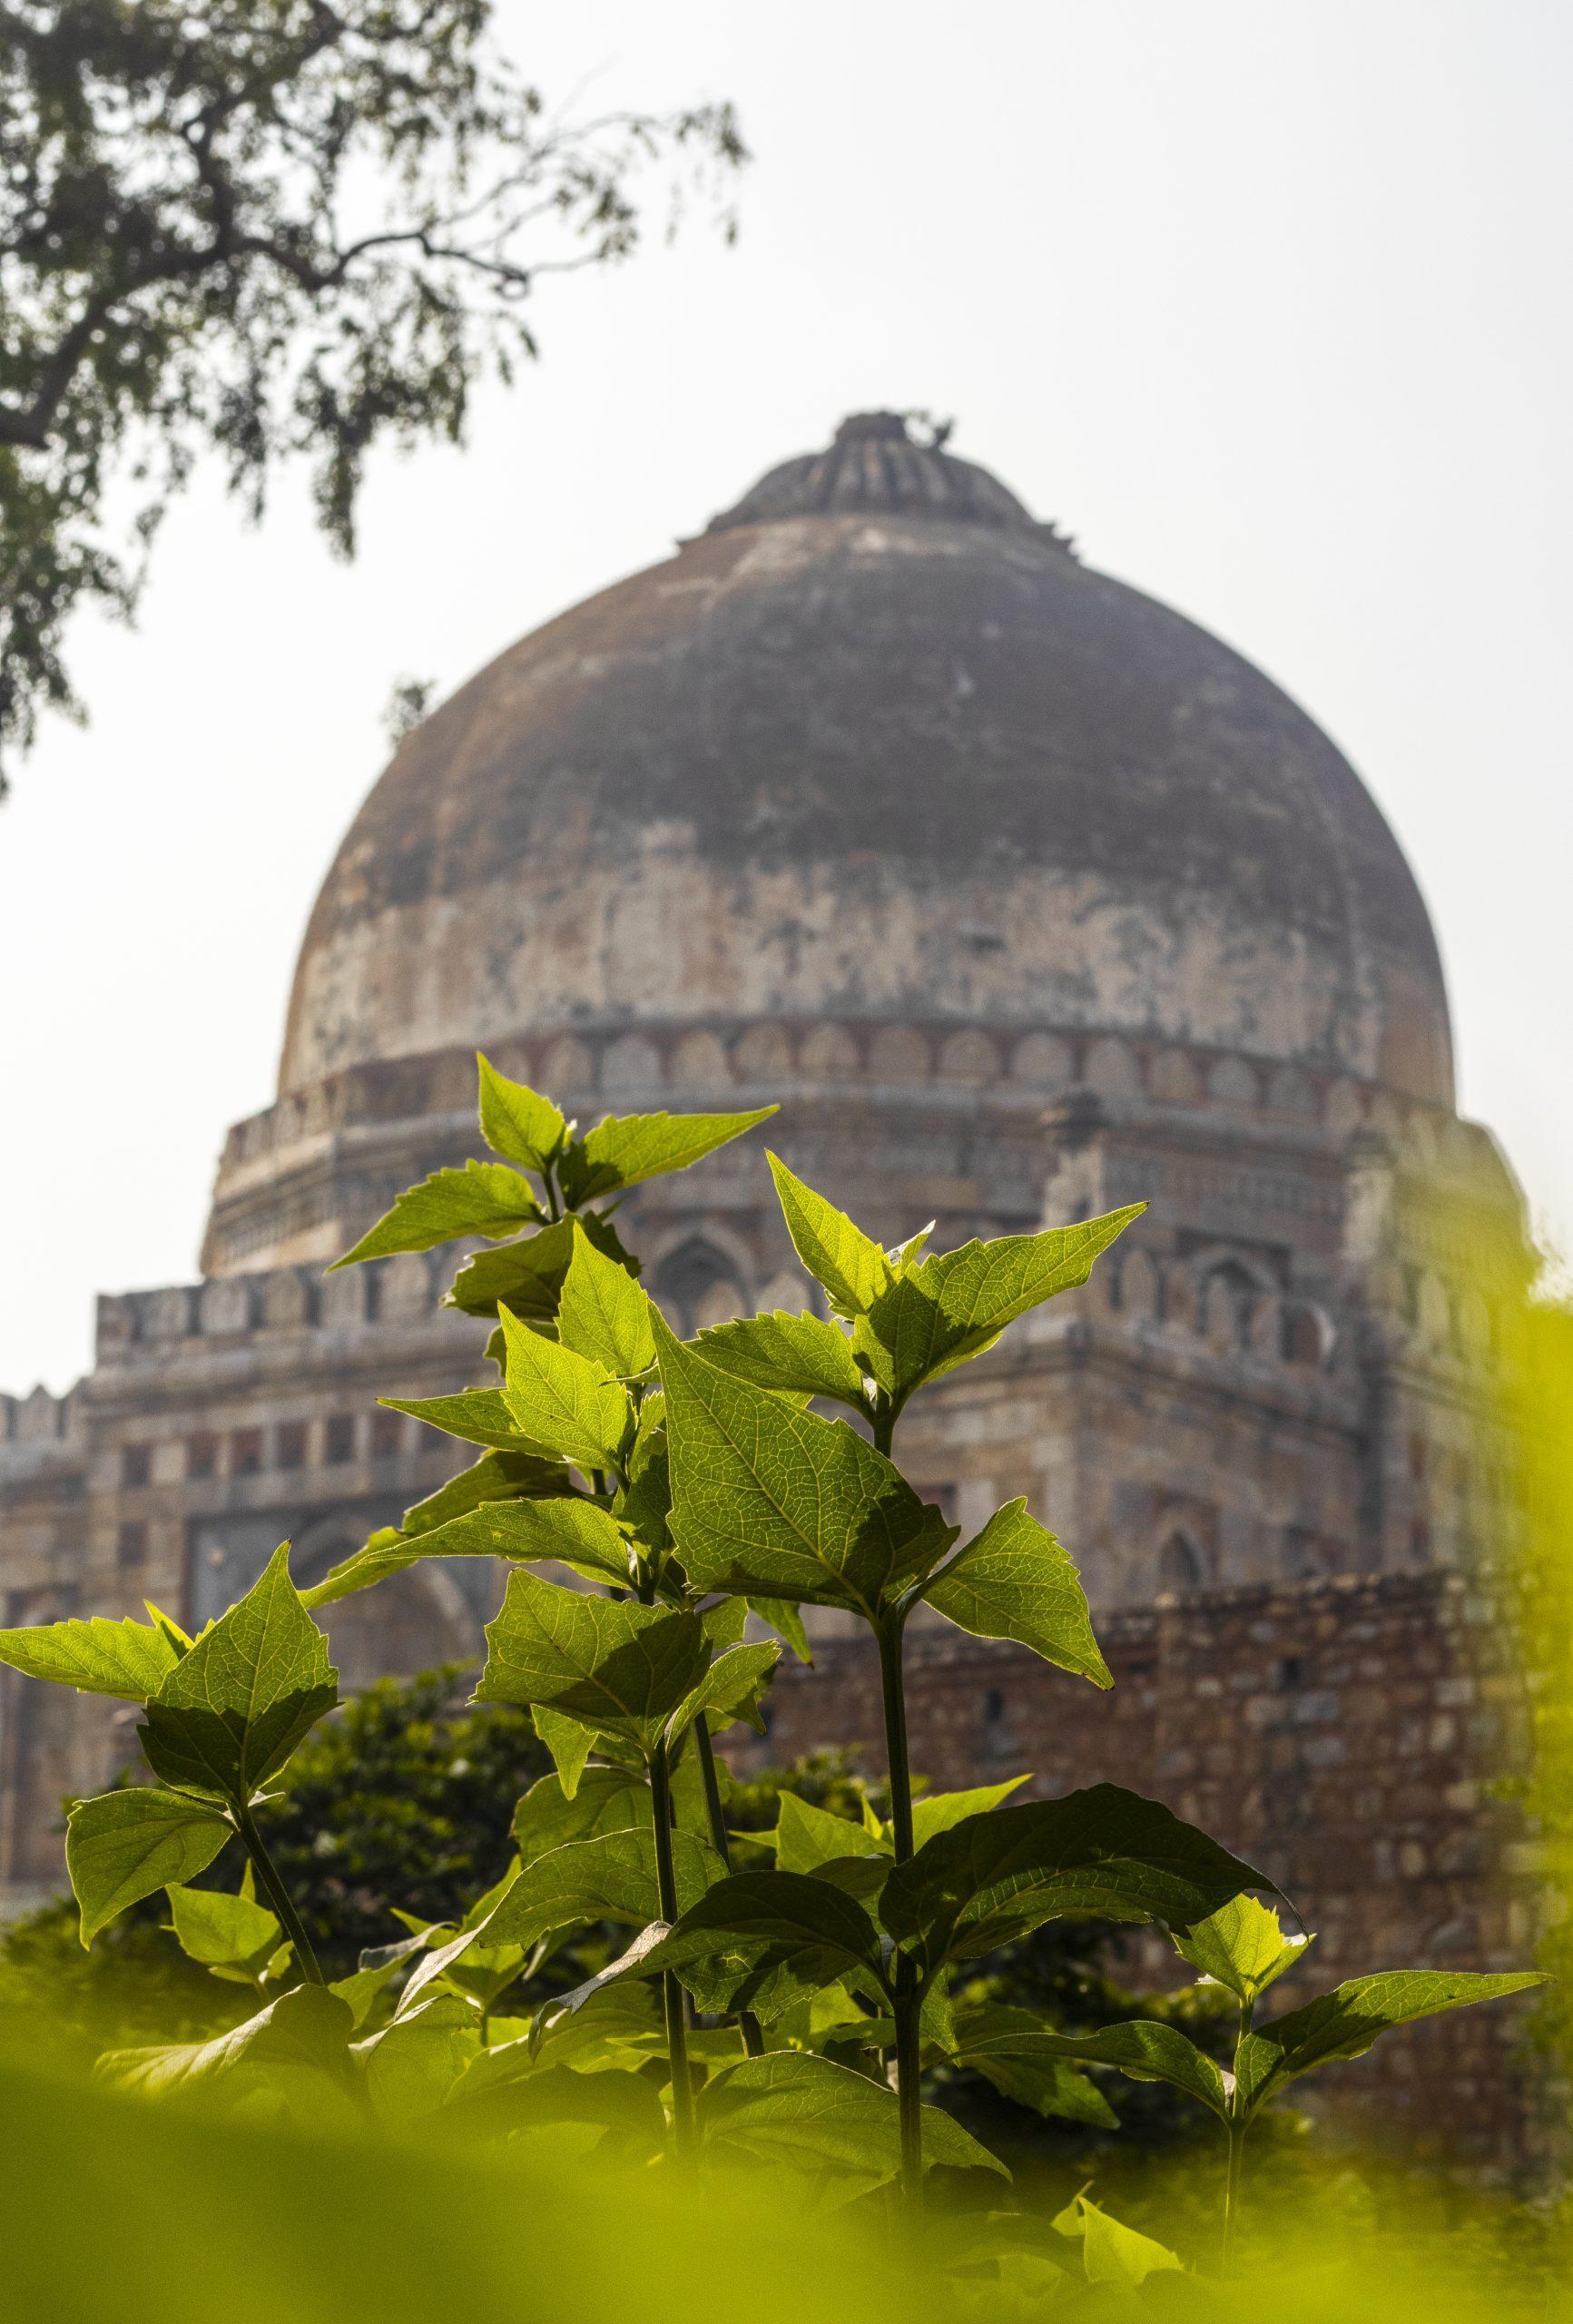 A dome in Lodhi Garden